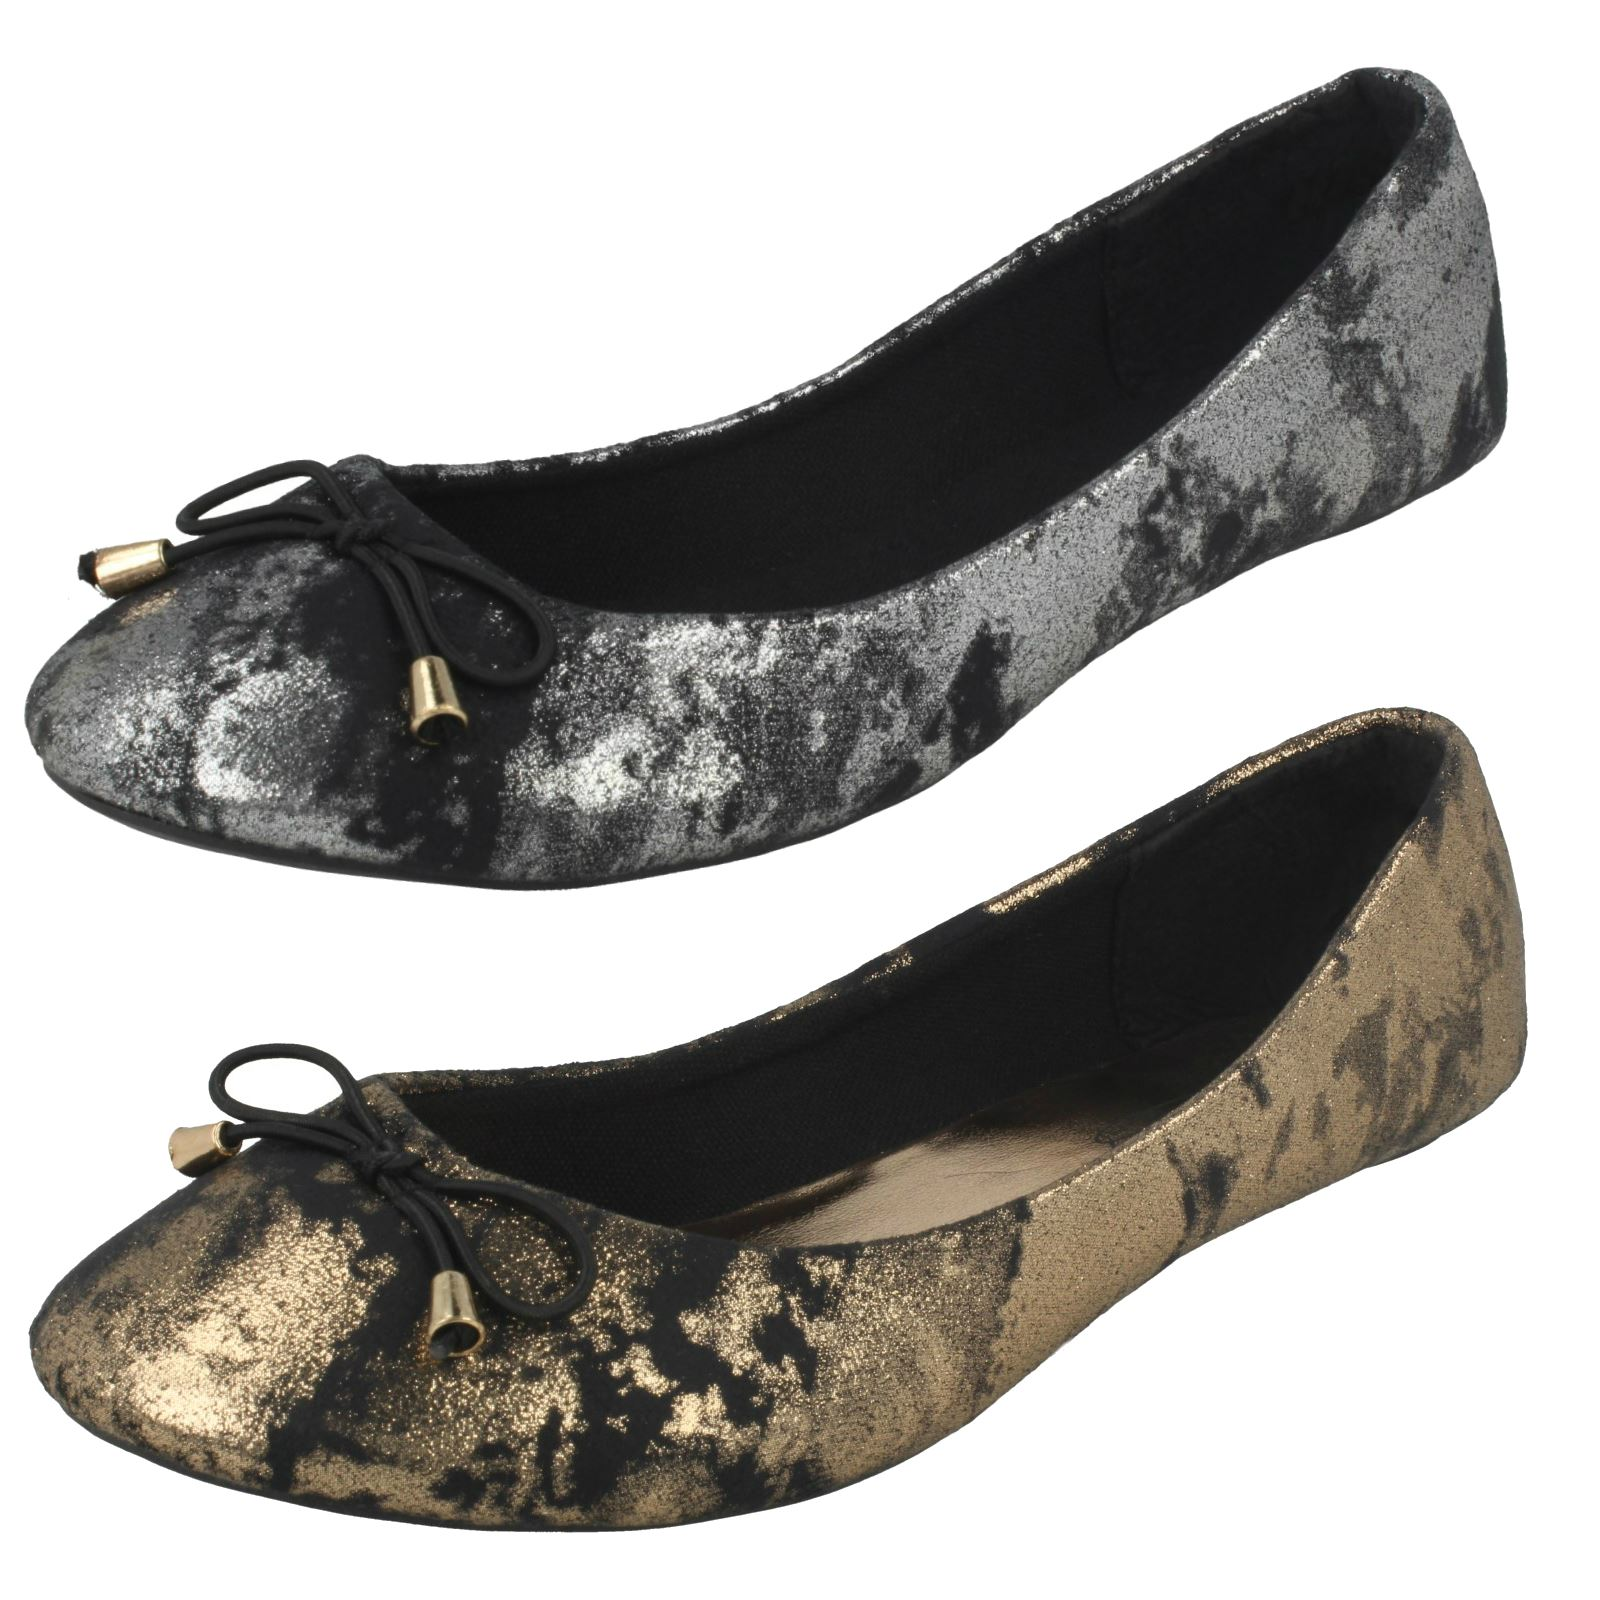 Ladies Spot On Ballerina Style Shoes